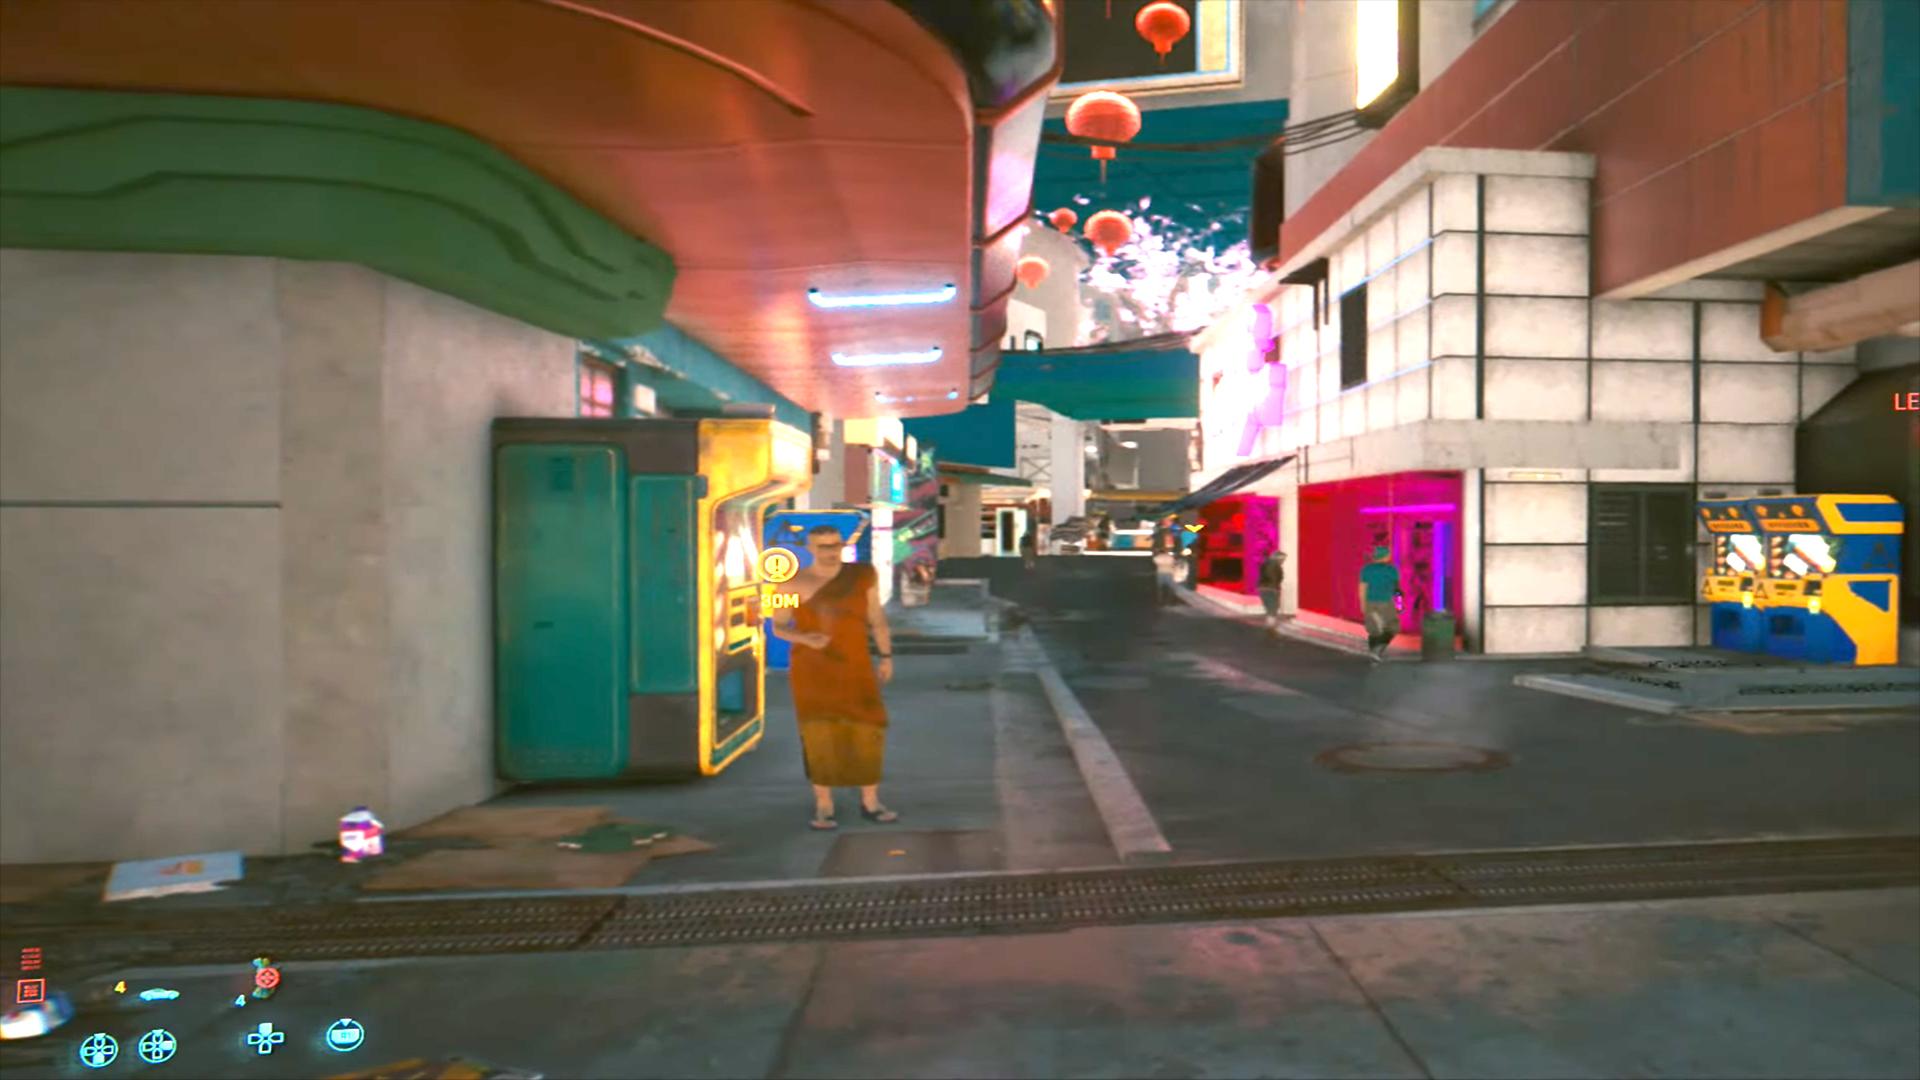 cyberpunk 2077 version playstation 4 fat